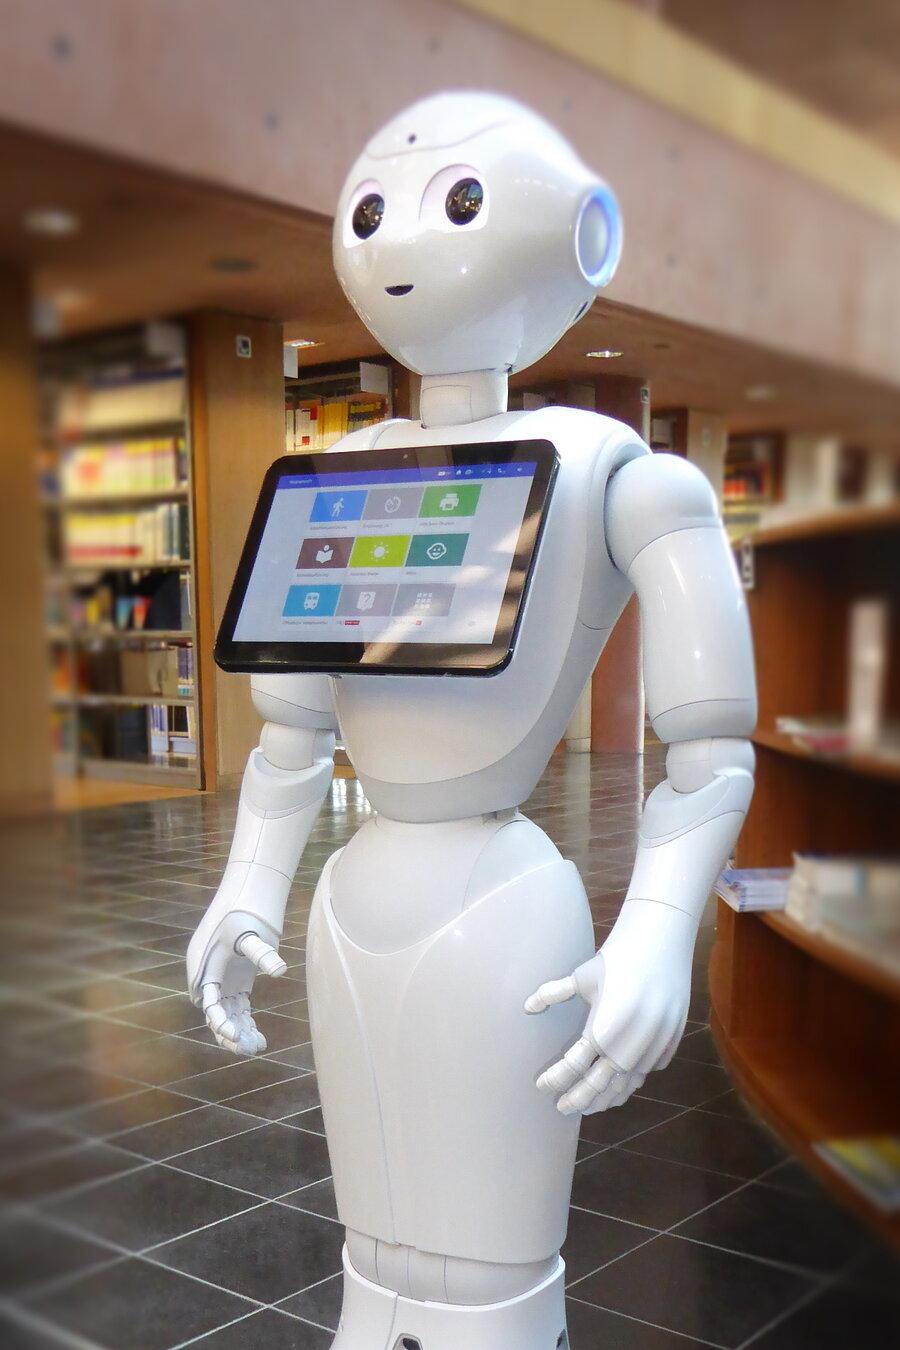 Bibliotheksroboter Wilma